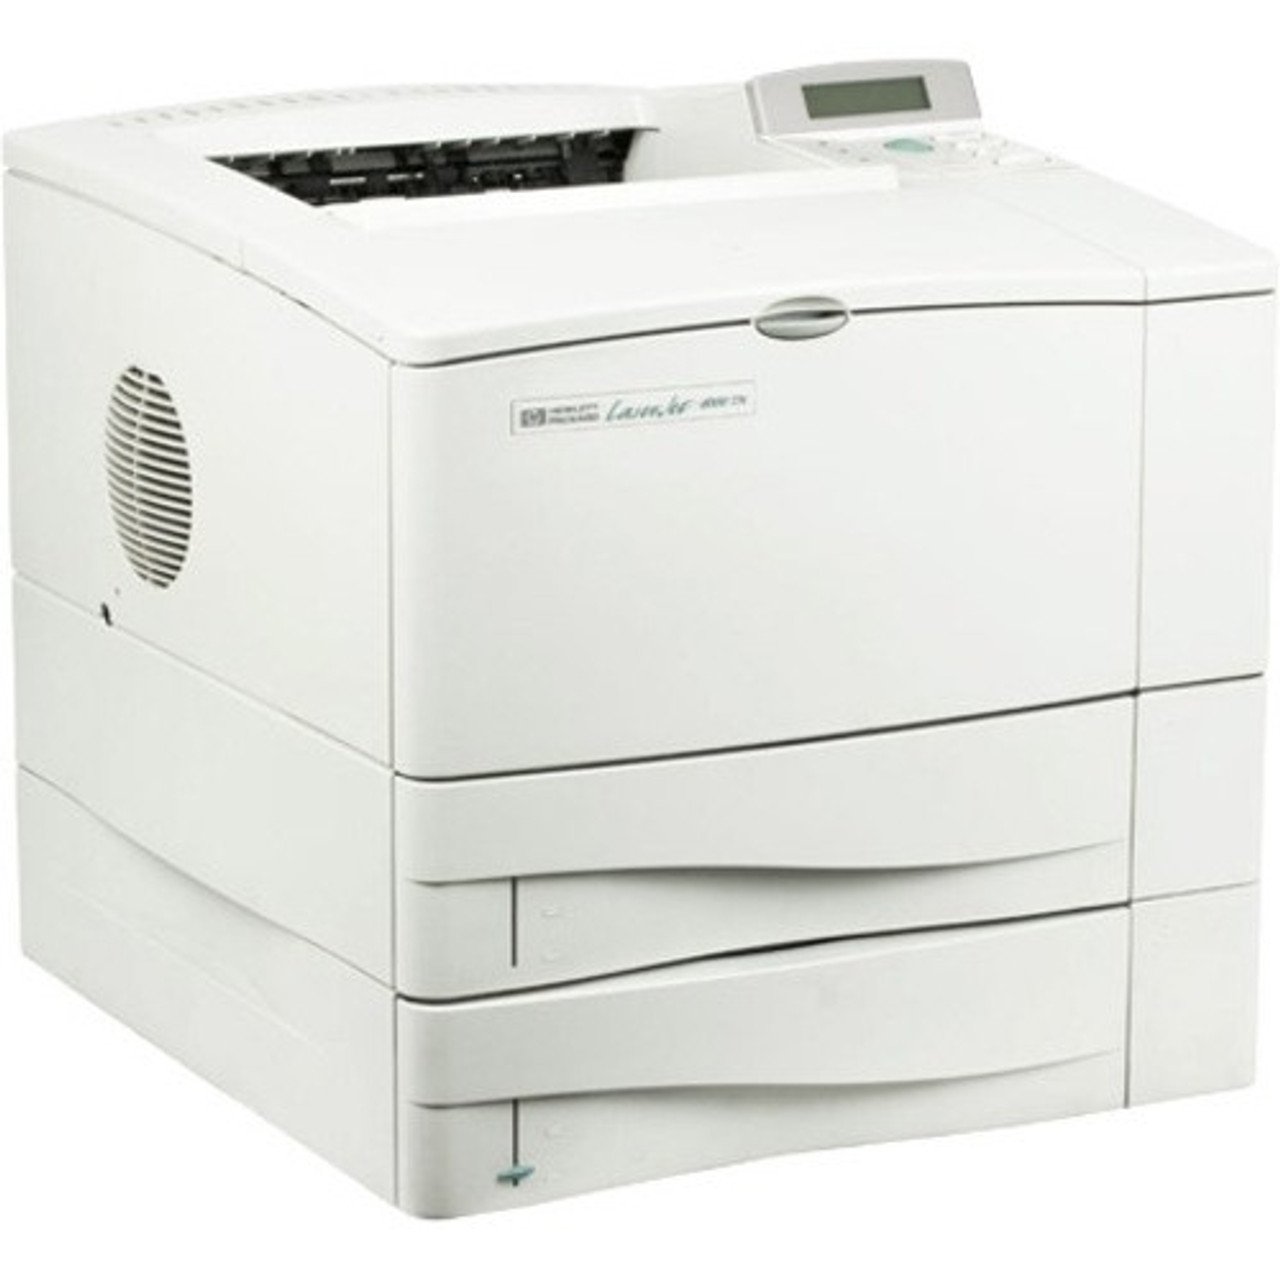 HP LaserJet 4000tn - C4121A - HP Laser Printer for sale